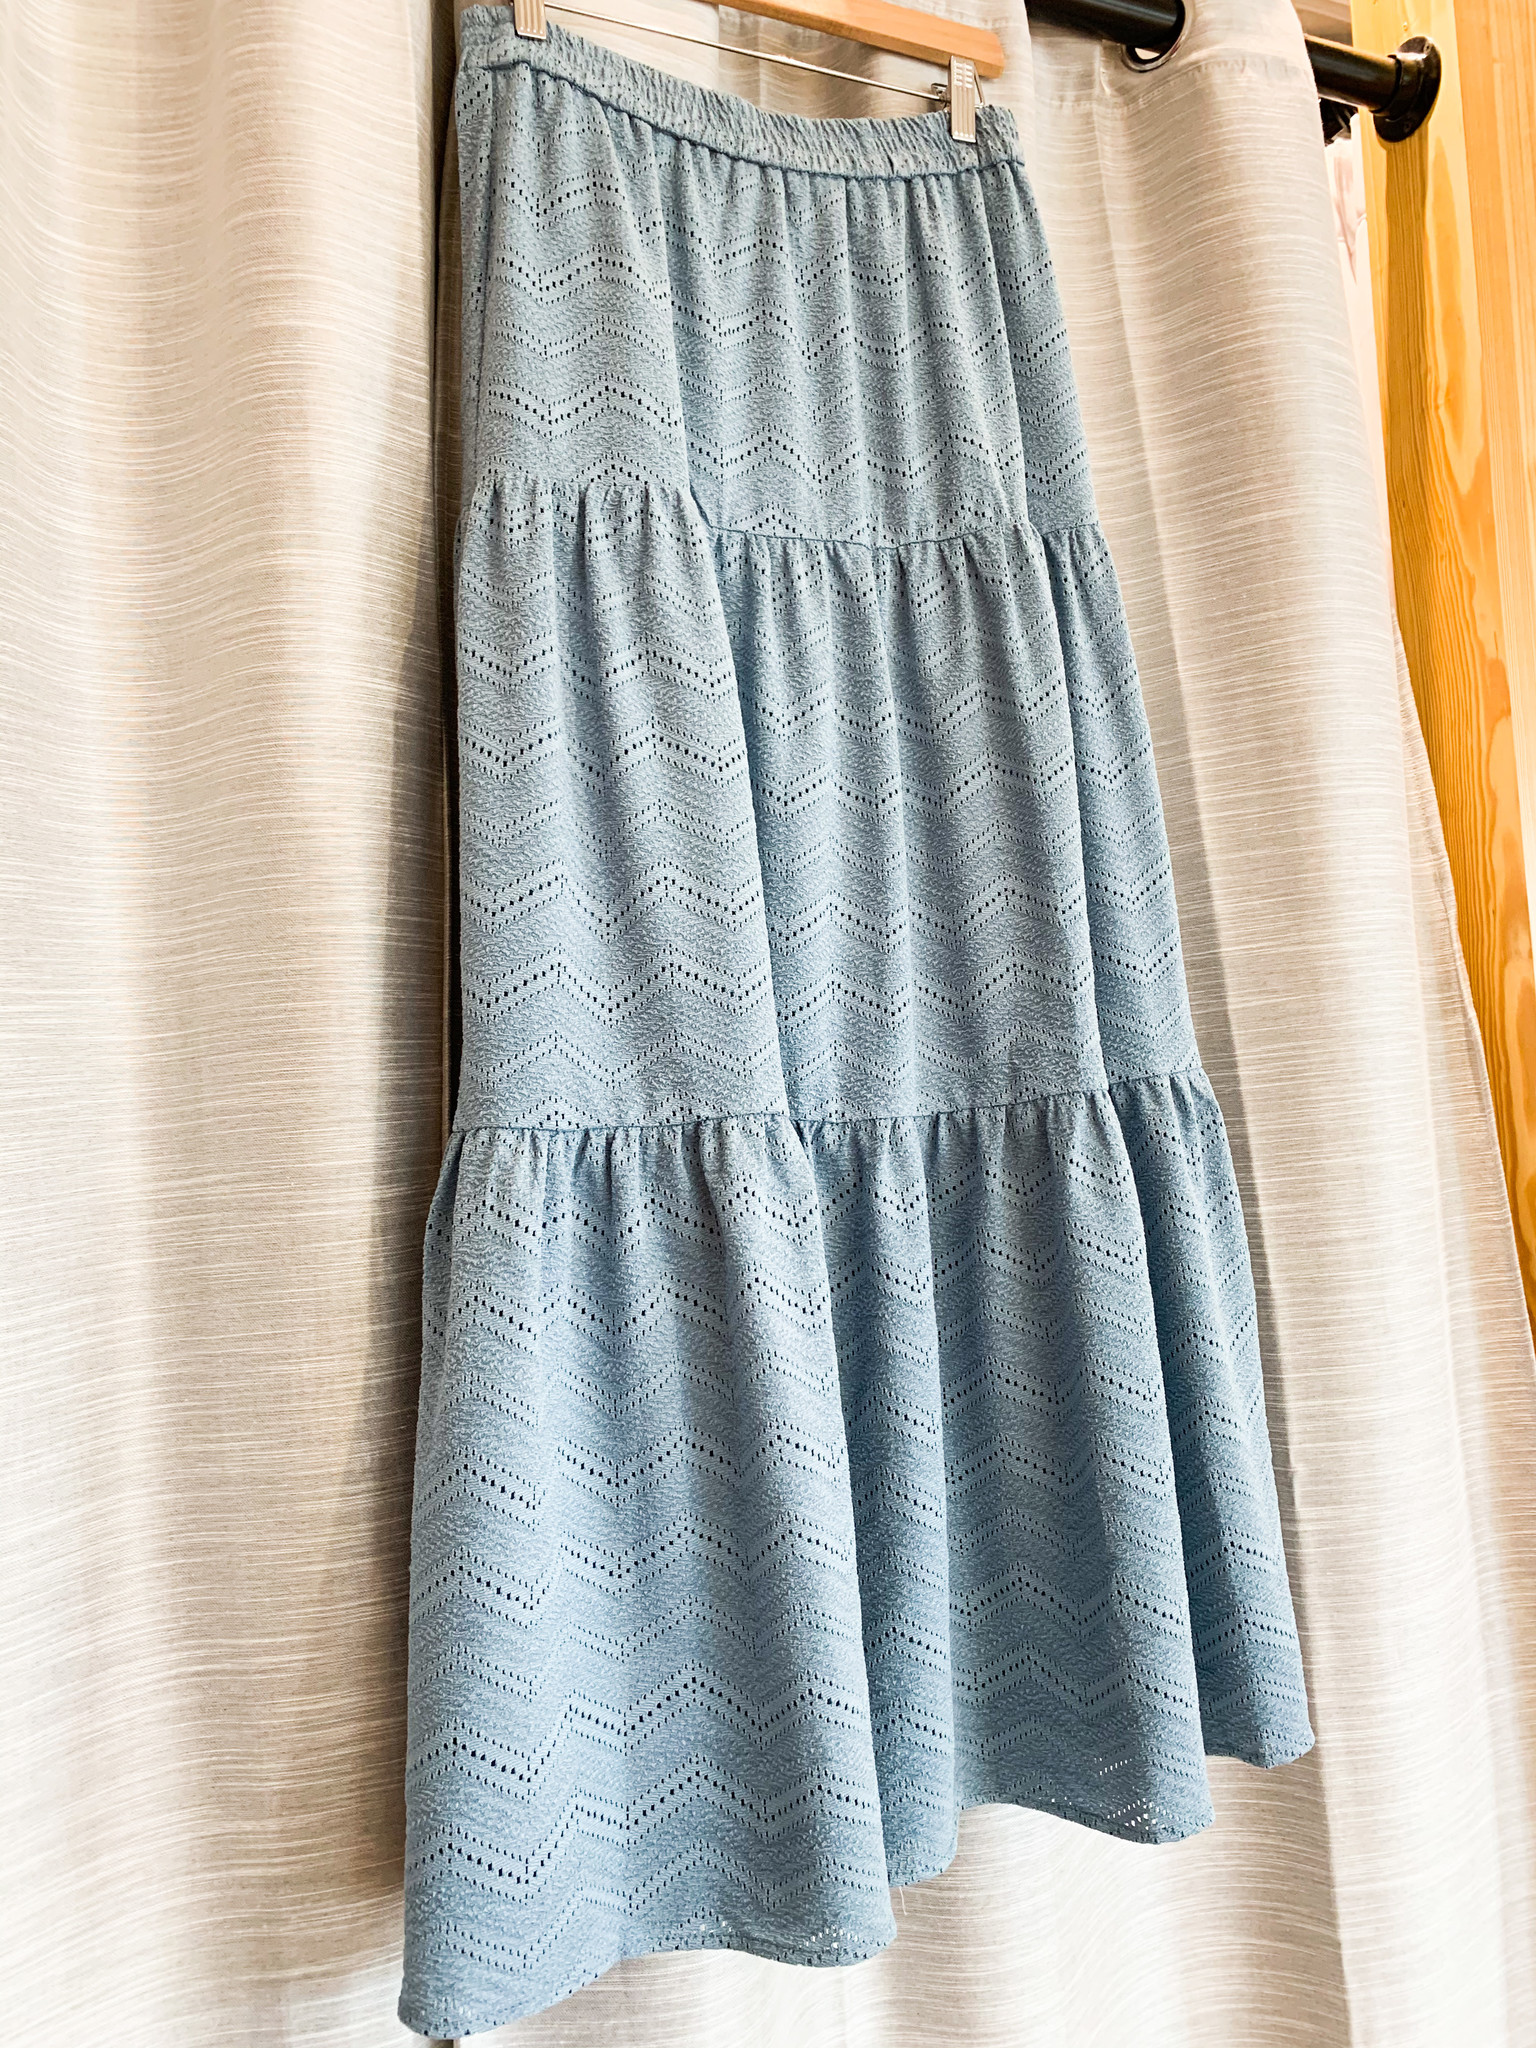 Dusty Blue Tiered Ruffle Maxi Skirt